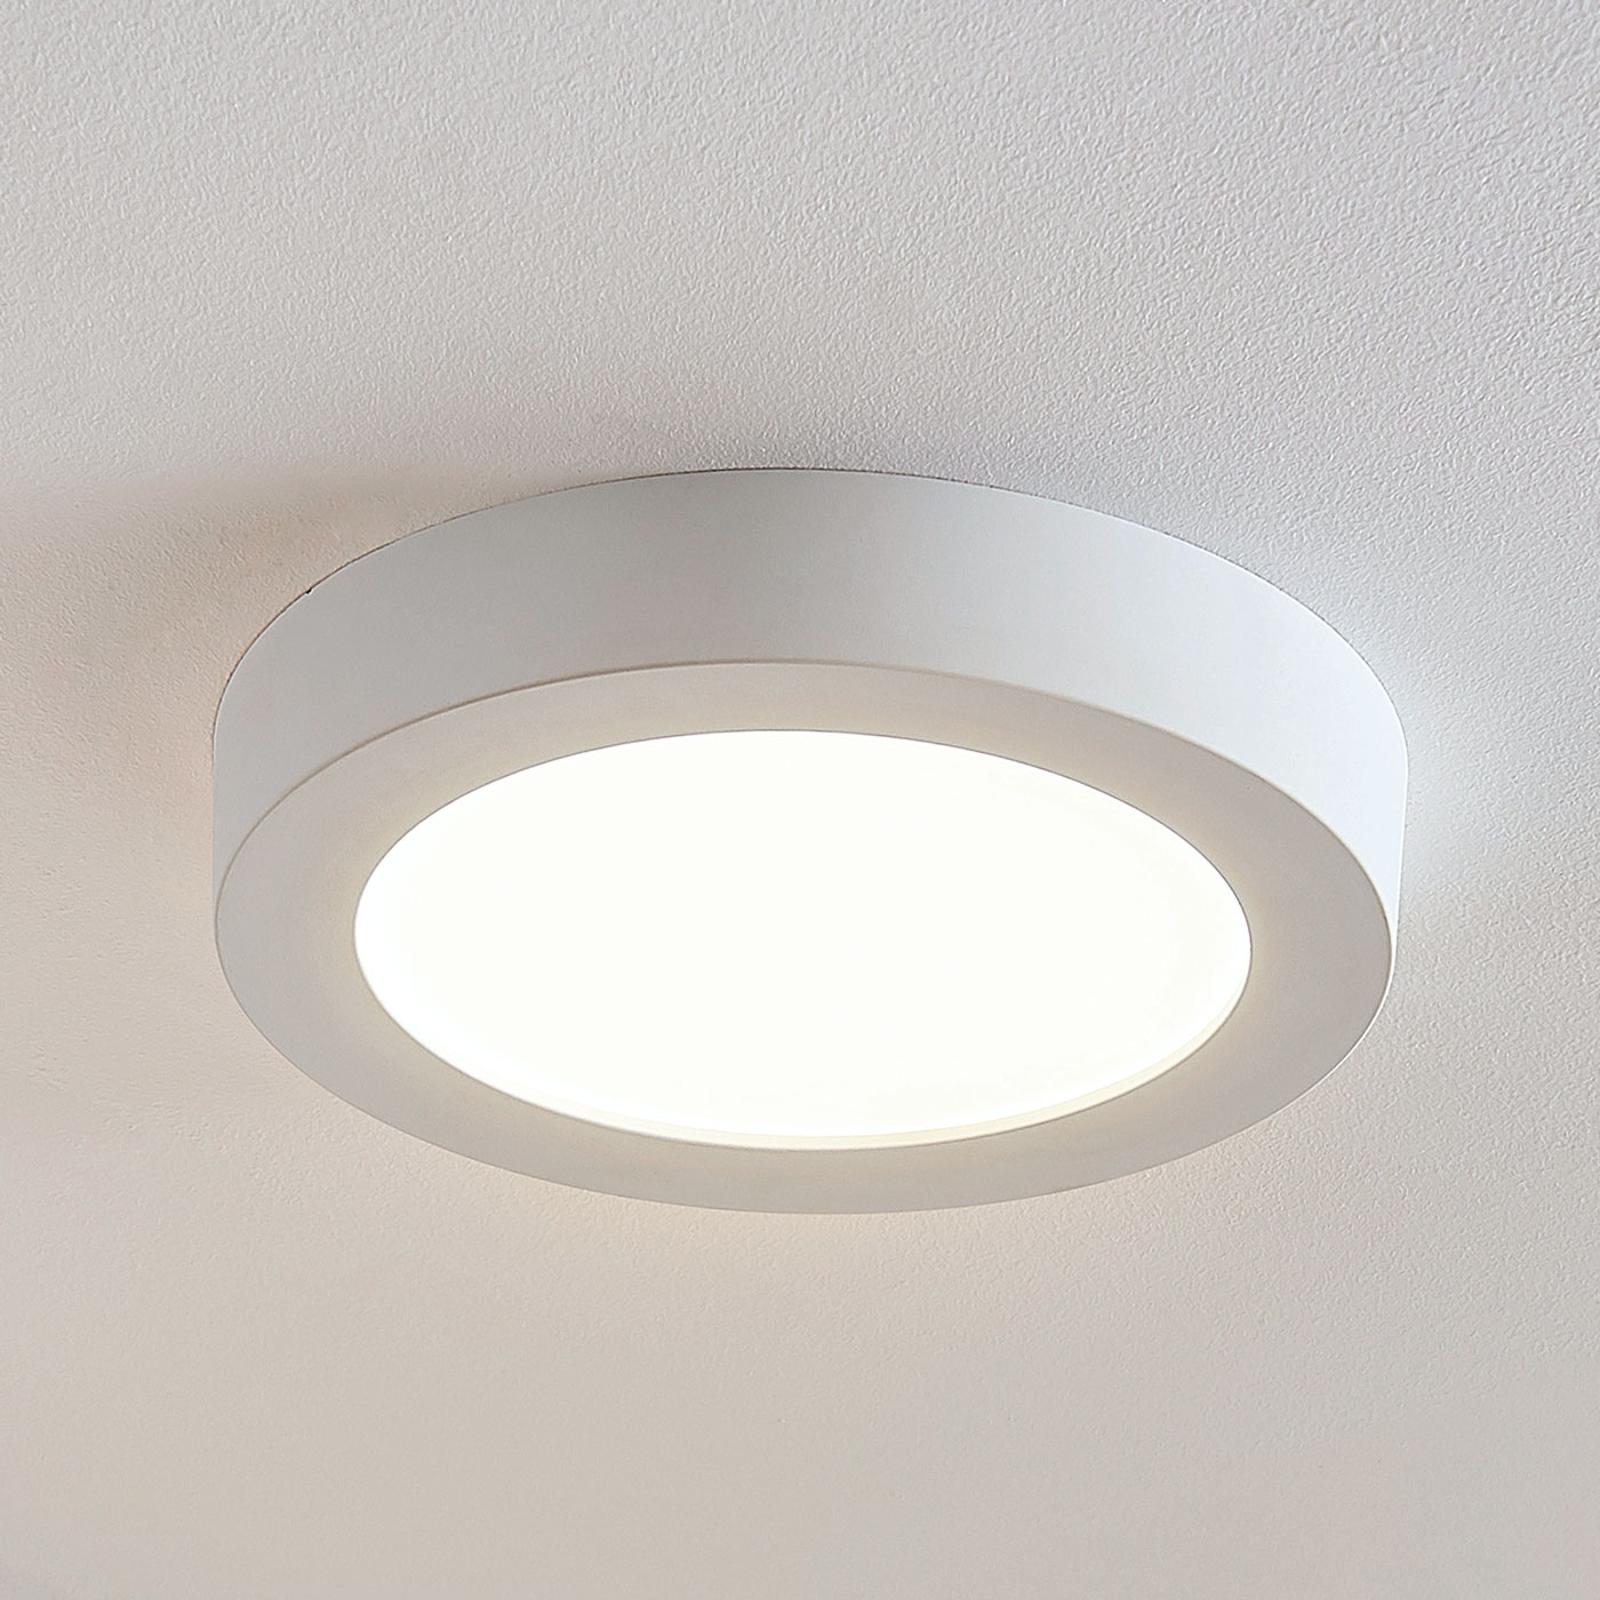 LED-loftlampe Marlo hvid 3000K rund 25,2cm